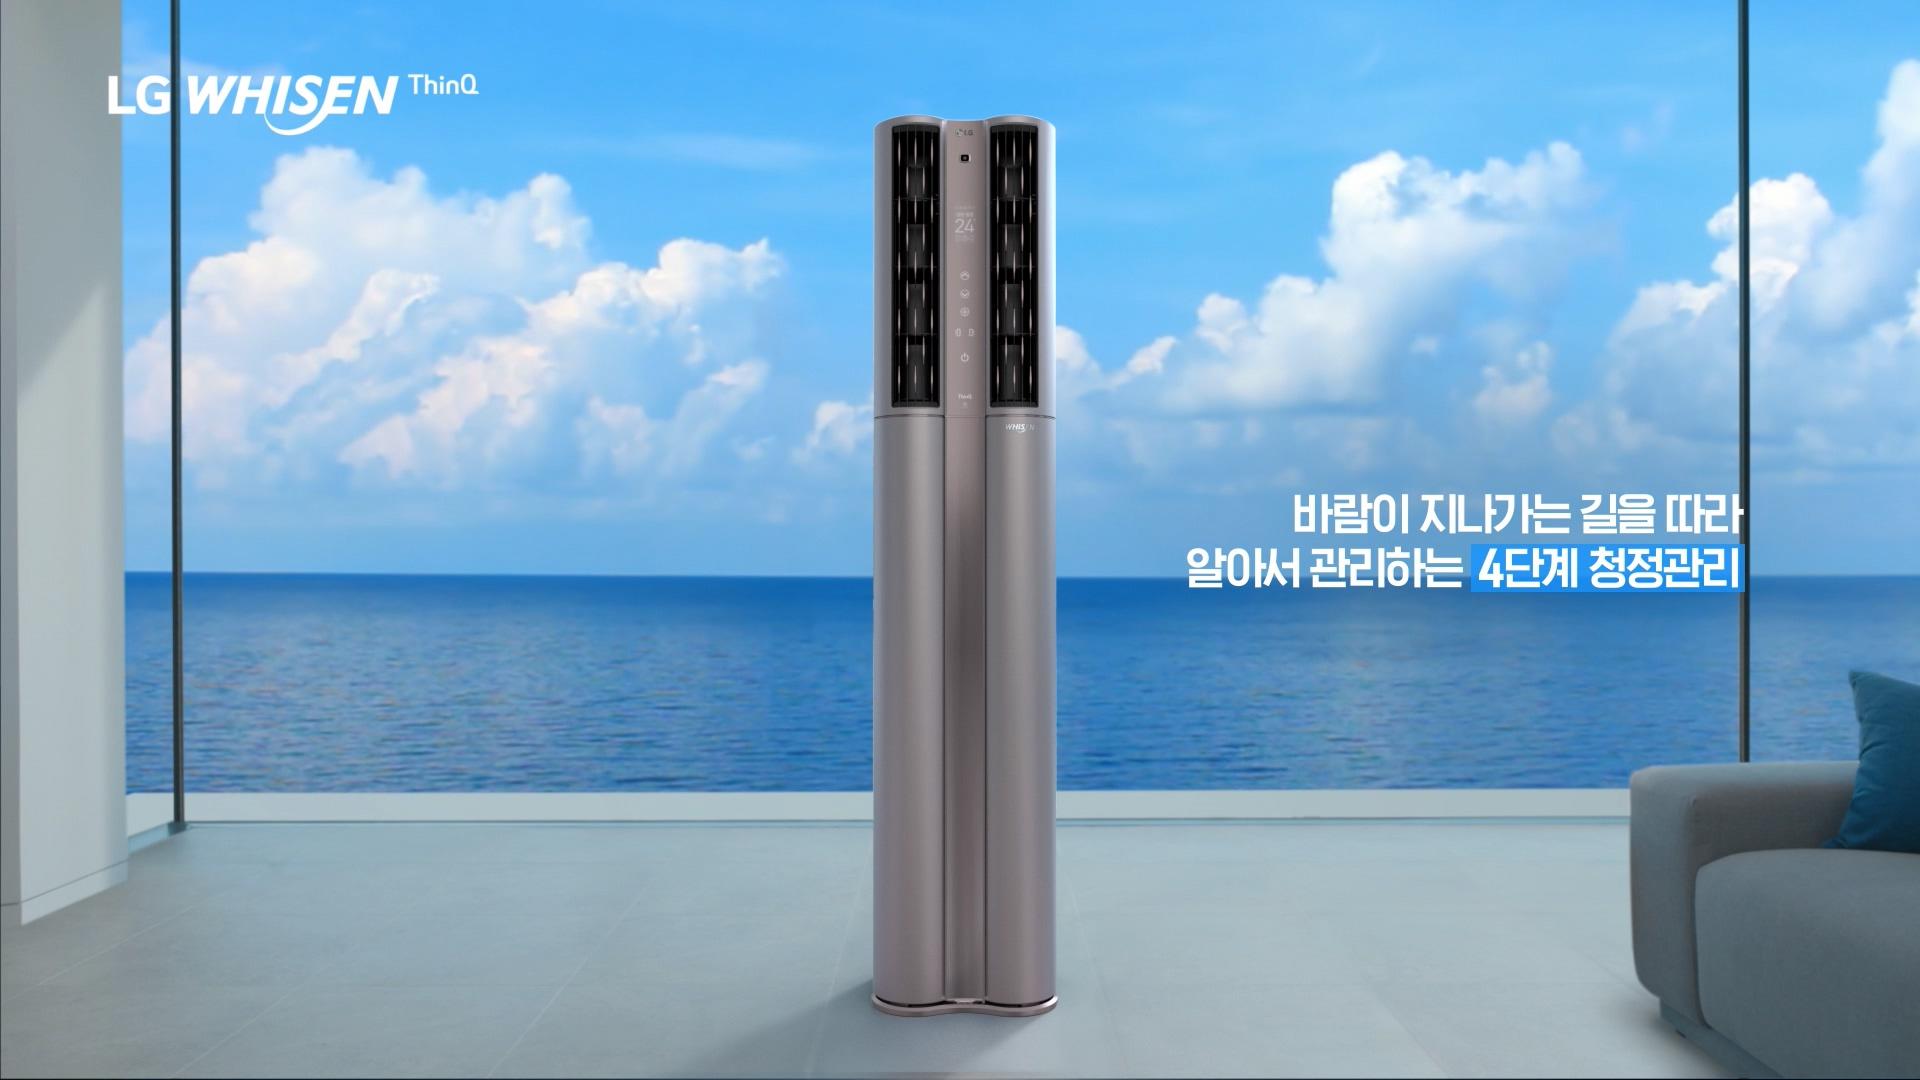 LG 휘센 씽큐 에어컨 광고영상 중 4단계 청정관리를 소개하는 장면 캡처화면